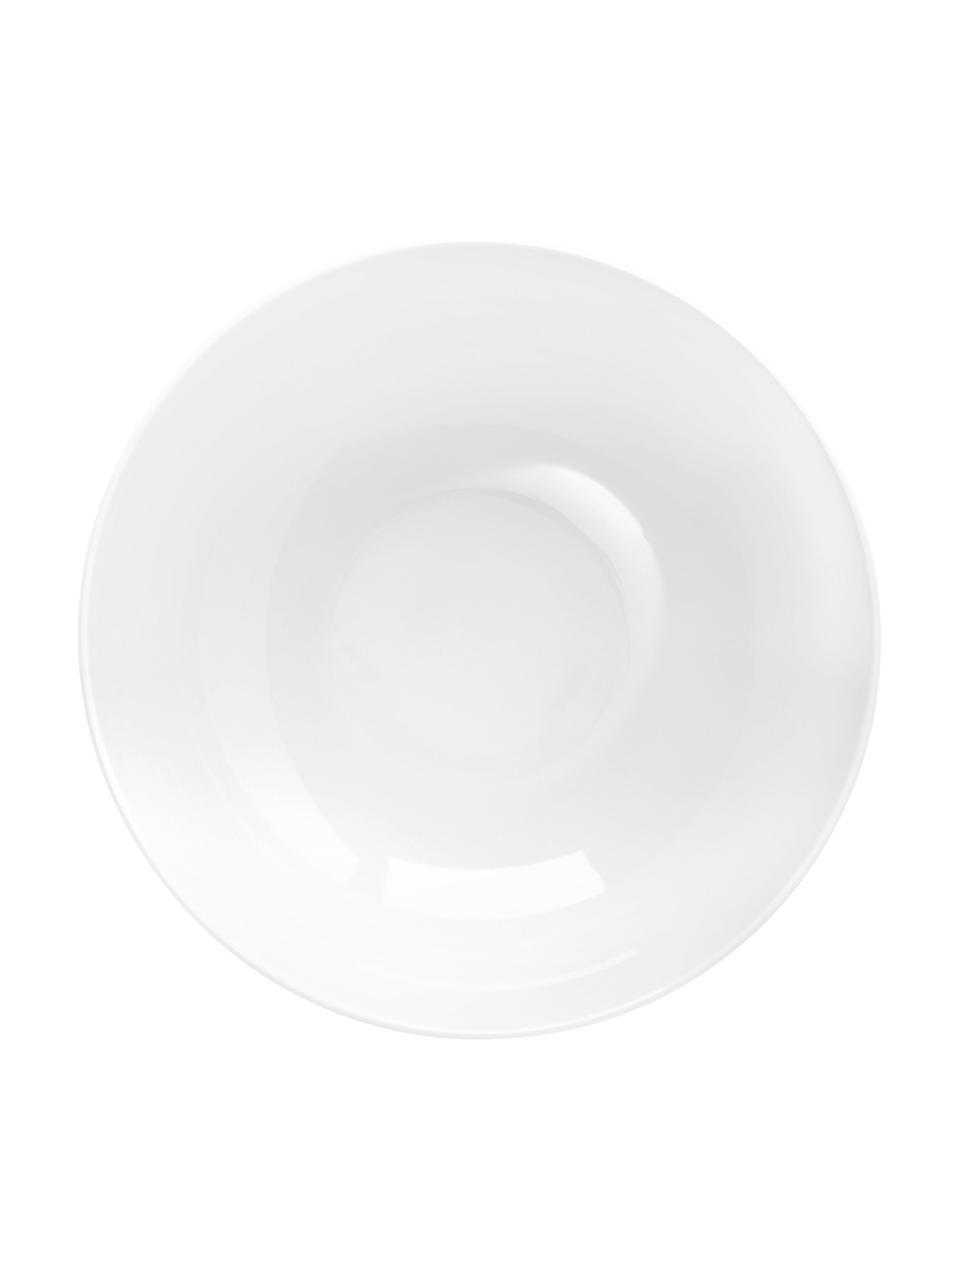 Insalatiera Puro, Porcellana, Bianco, Ø 25 x Alt. 10 cm